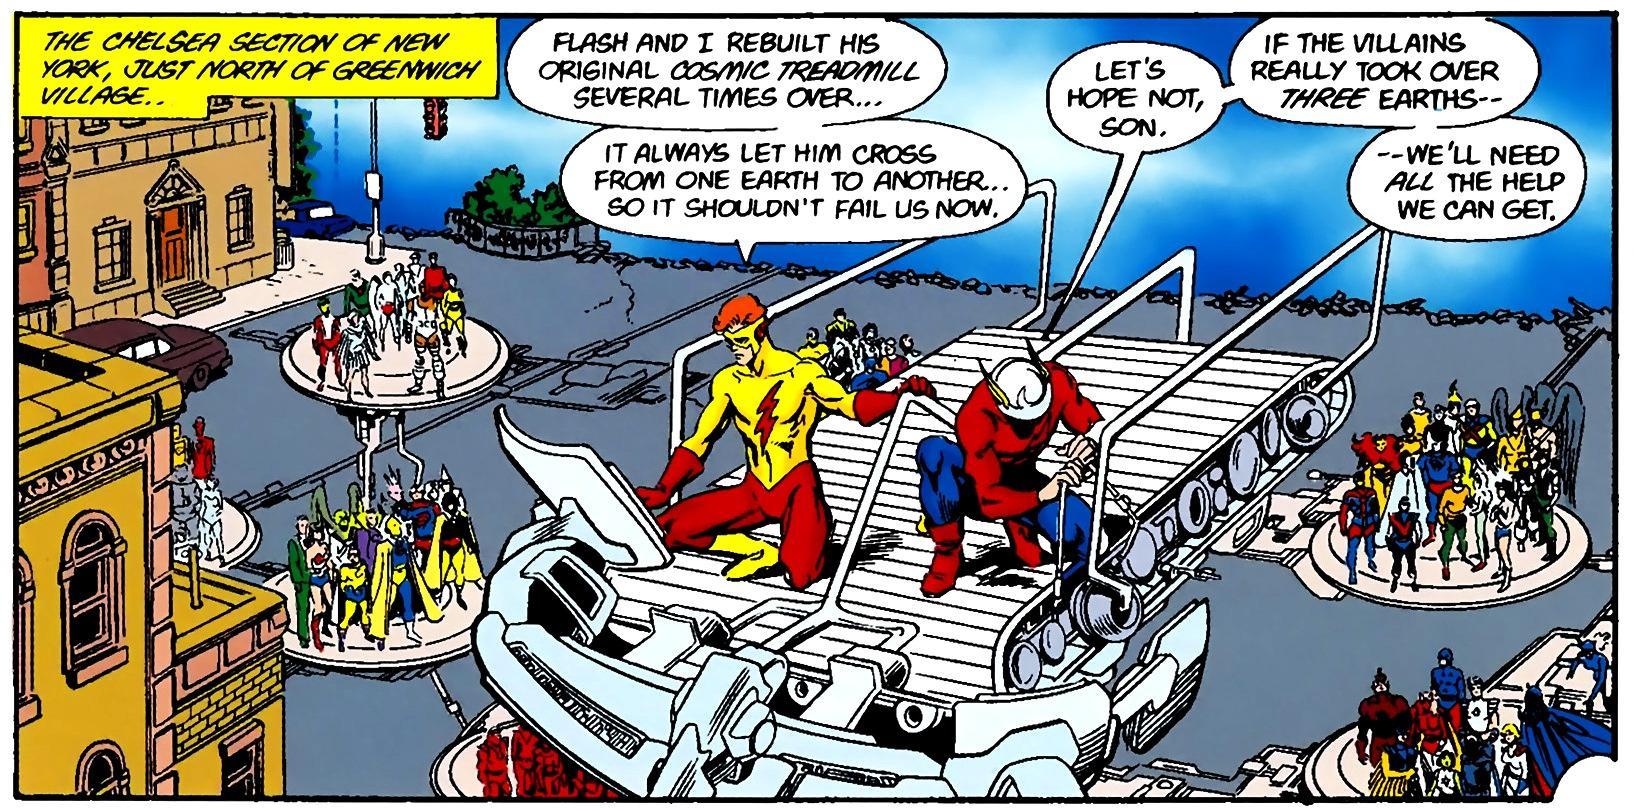 Flash's Cosmic Treadmill